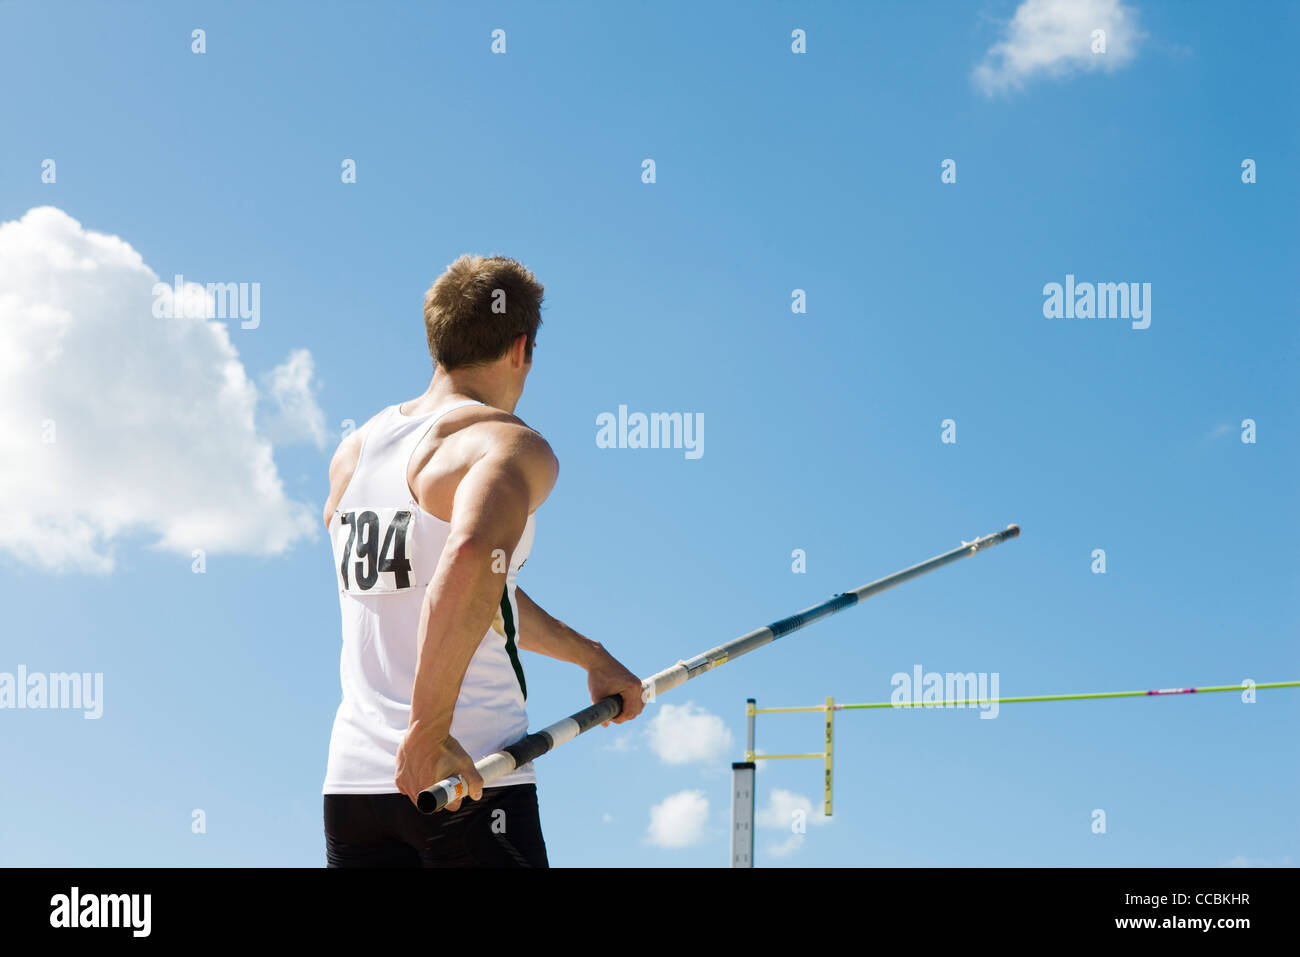 Sportler im Pole Vaulting Wettbewerb, Rückansicht Stockbild